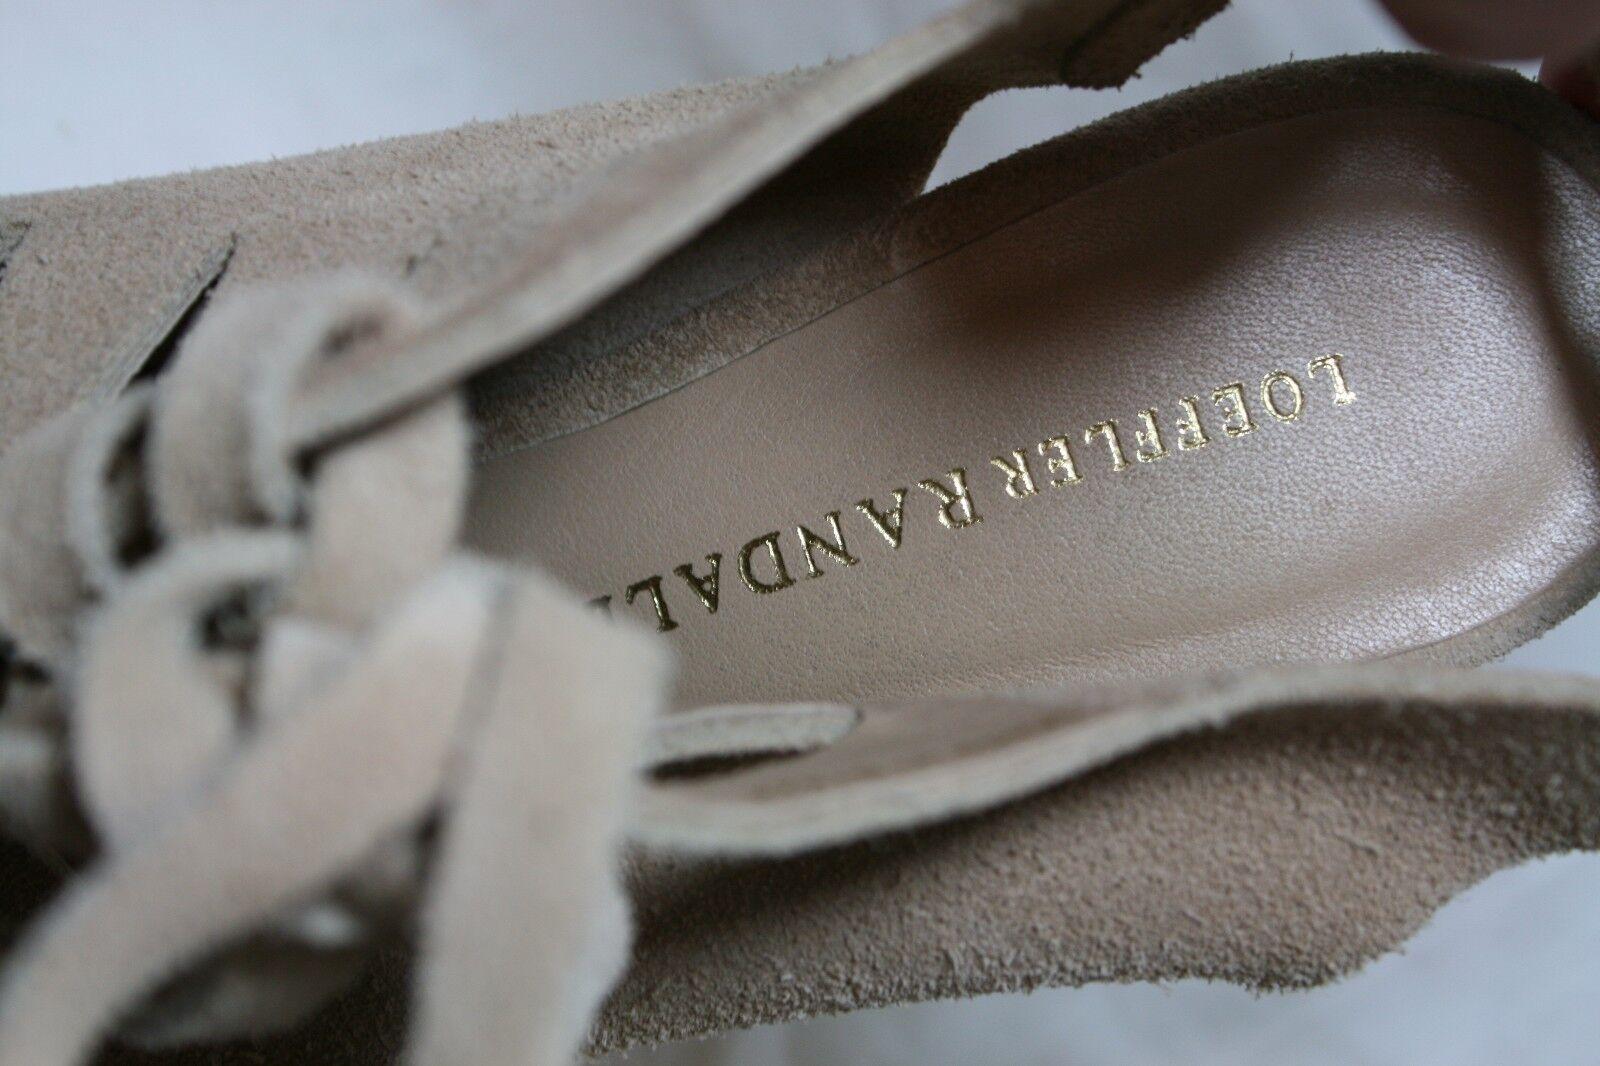 LOEFFLER RANDALL schuhe VIVIAN LACE UP NUDE WEDGE StiefelIES NUDE UP SUEDE 8  495 SLINGBACK 9f8641